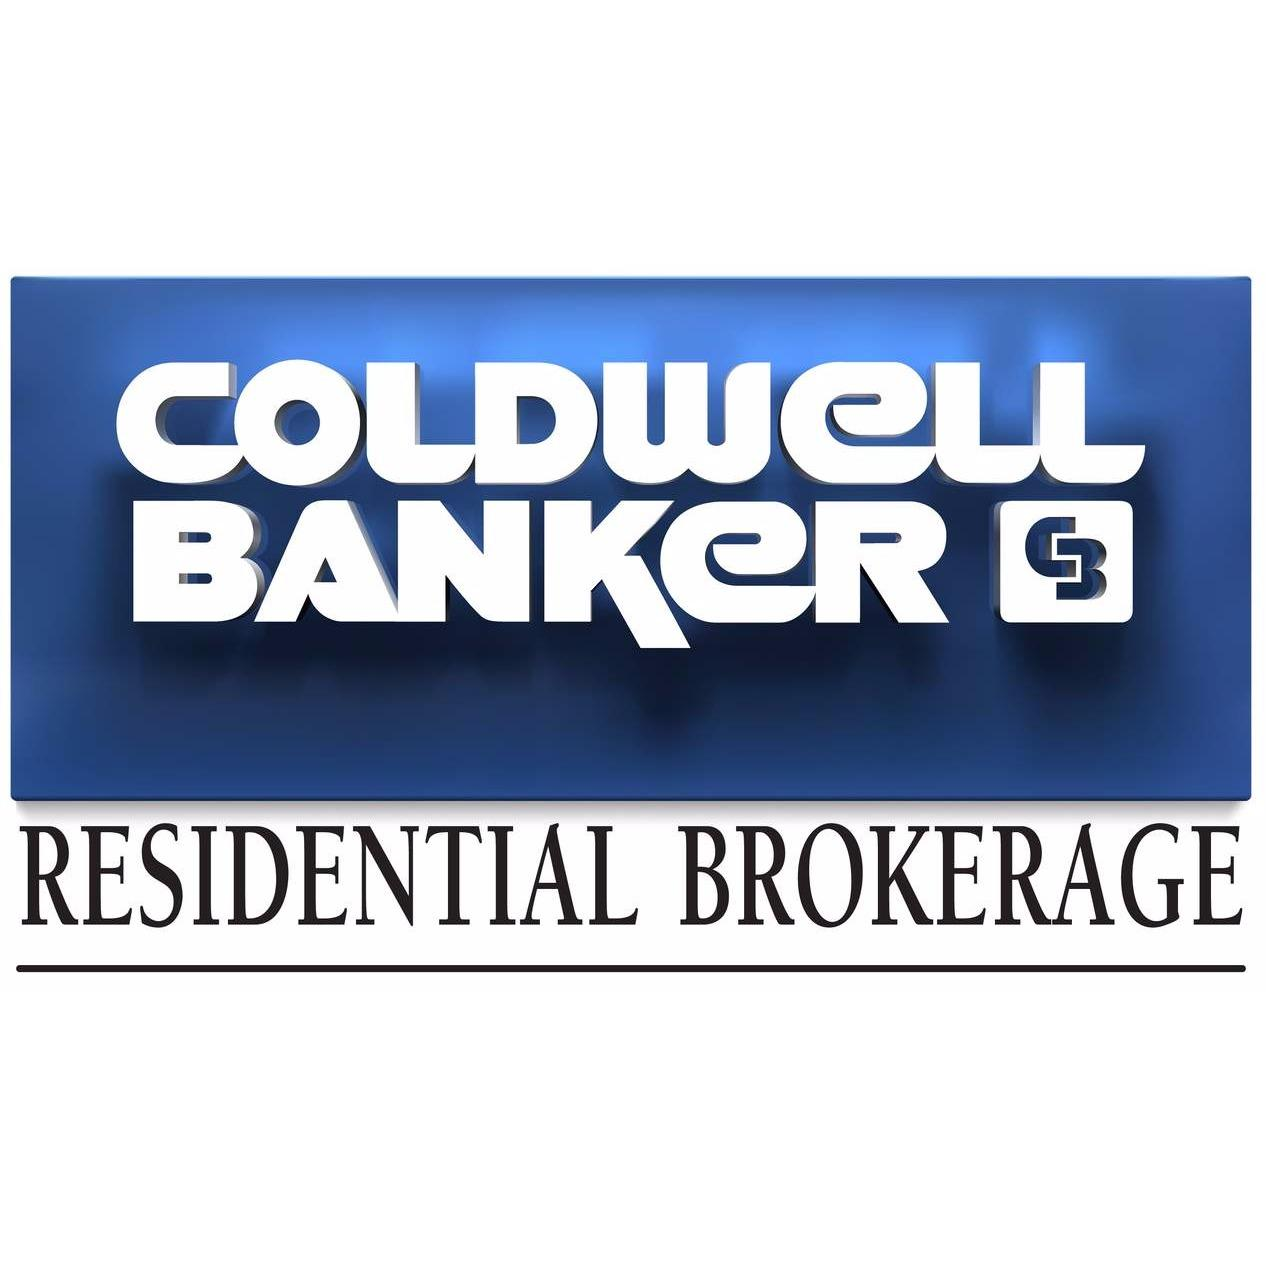 Christine Prutzman - Coldwell Banker Residential Brokerage